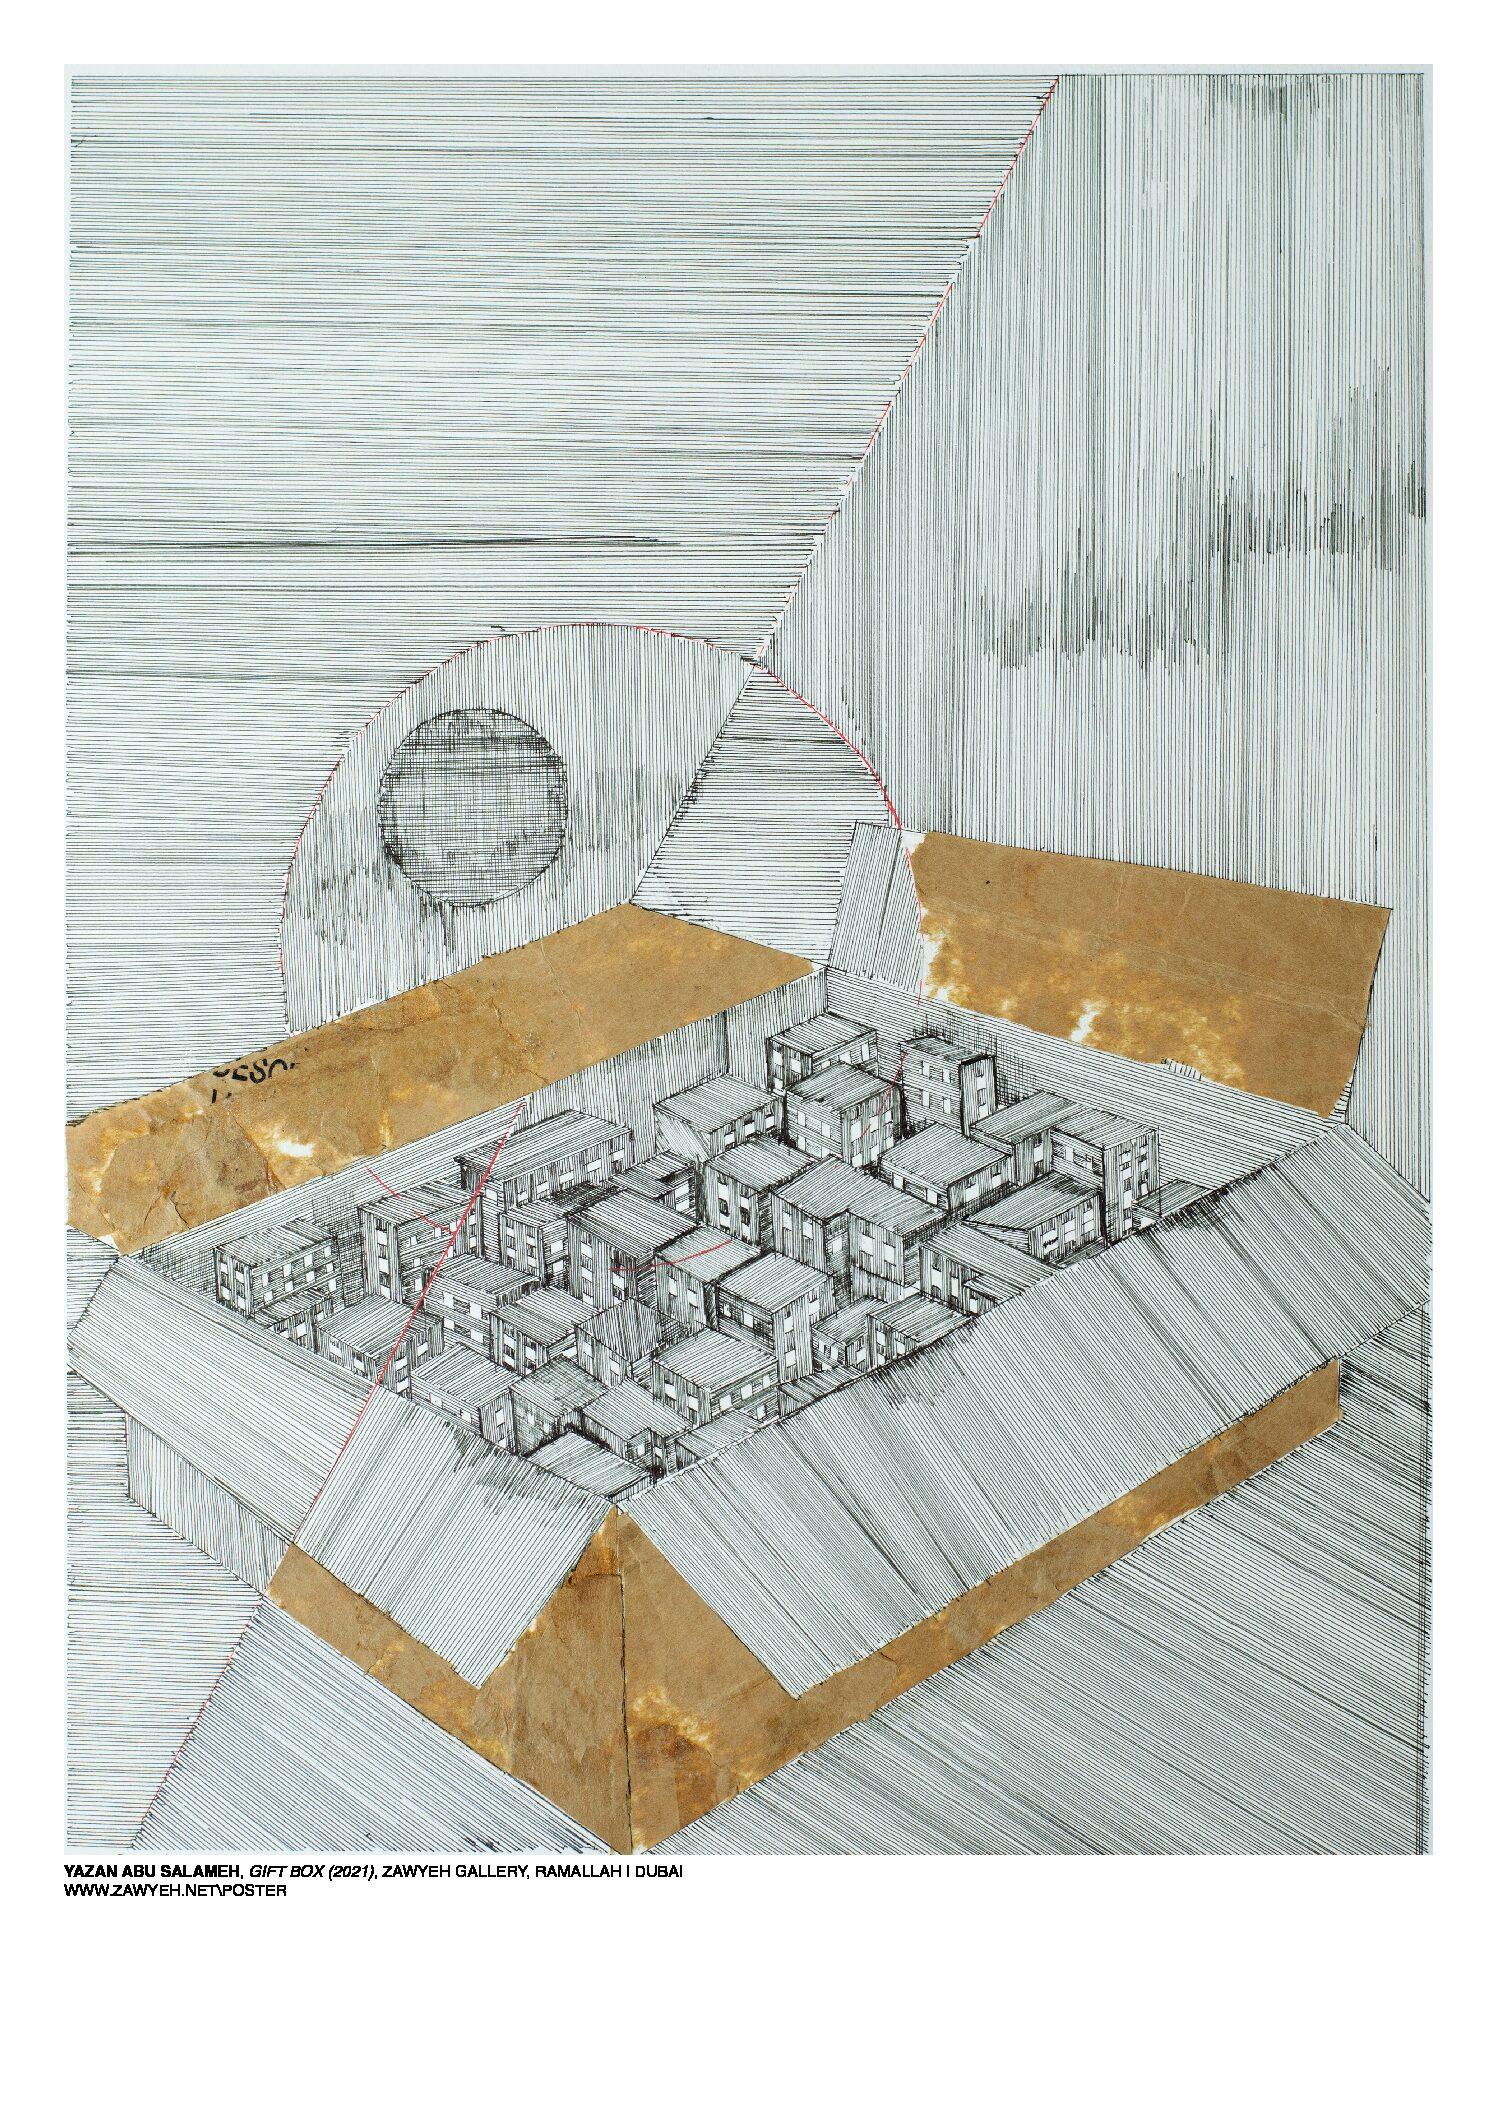 Gift Box by Yazan Abu Salameh